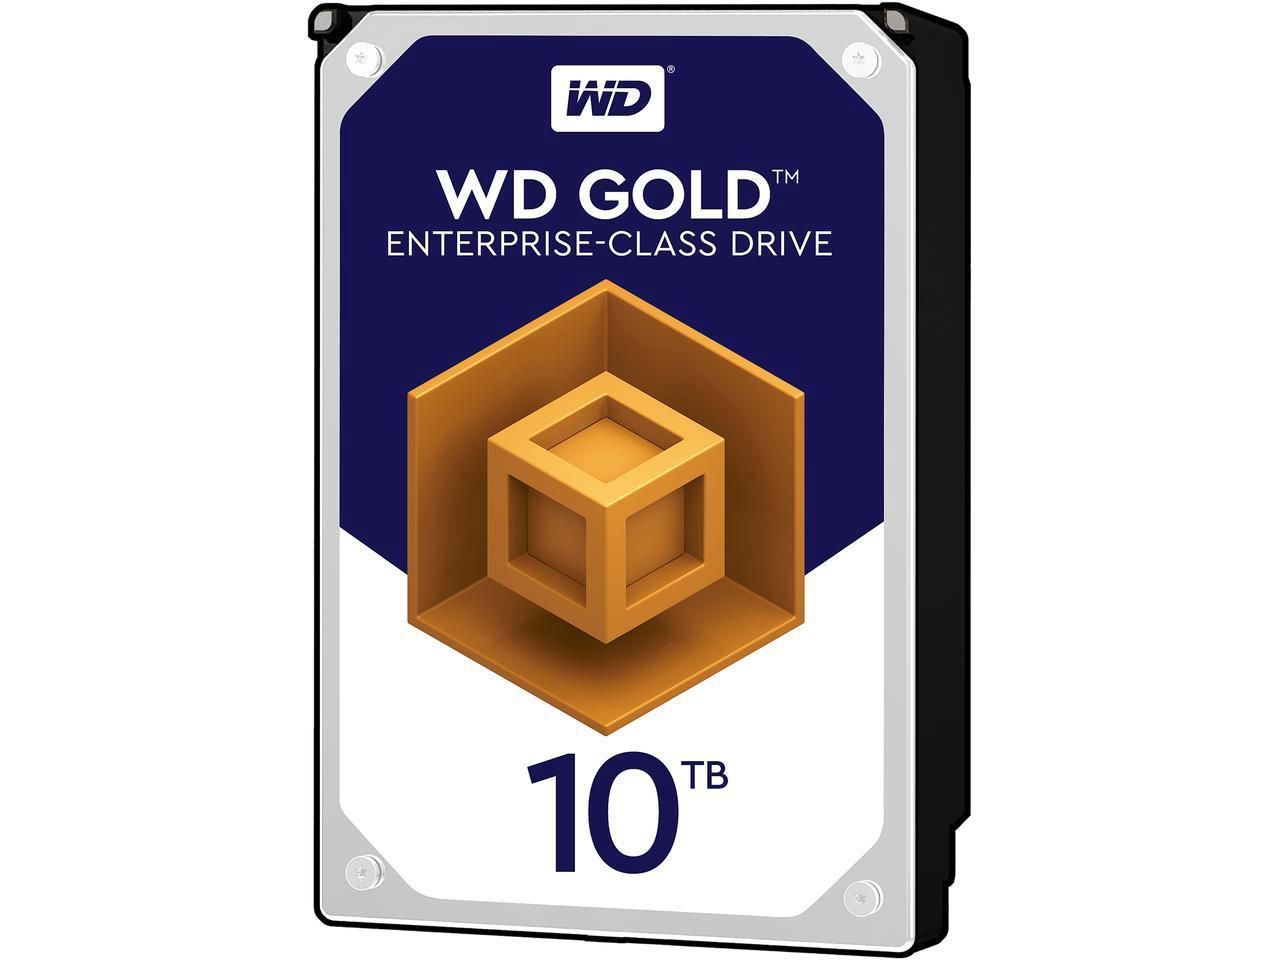 Newegg: 10TB Western digital Gold Hard Drive $329.99